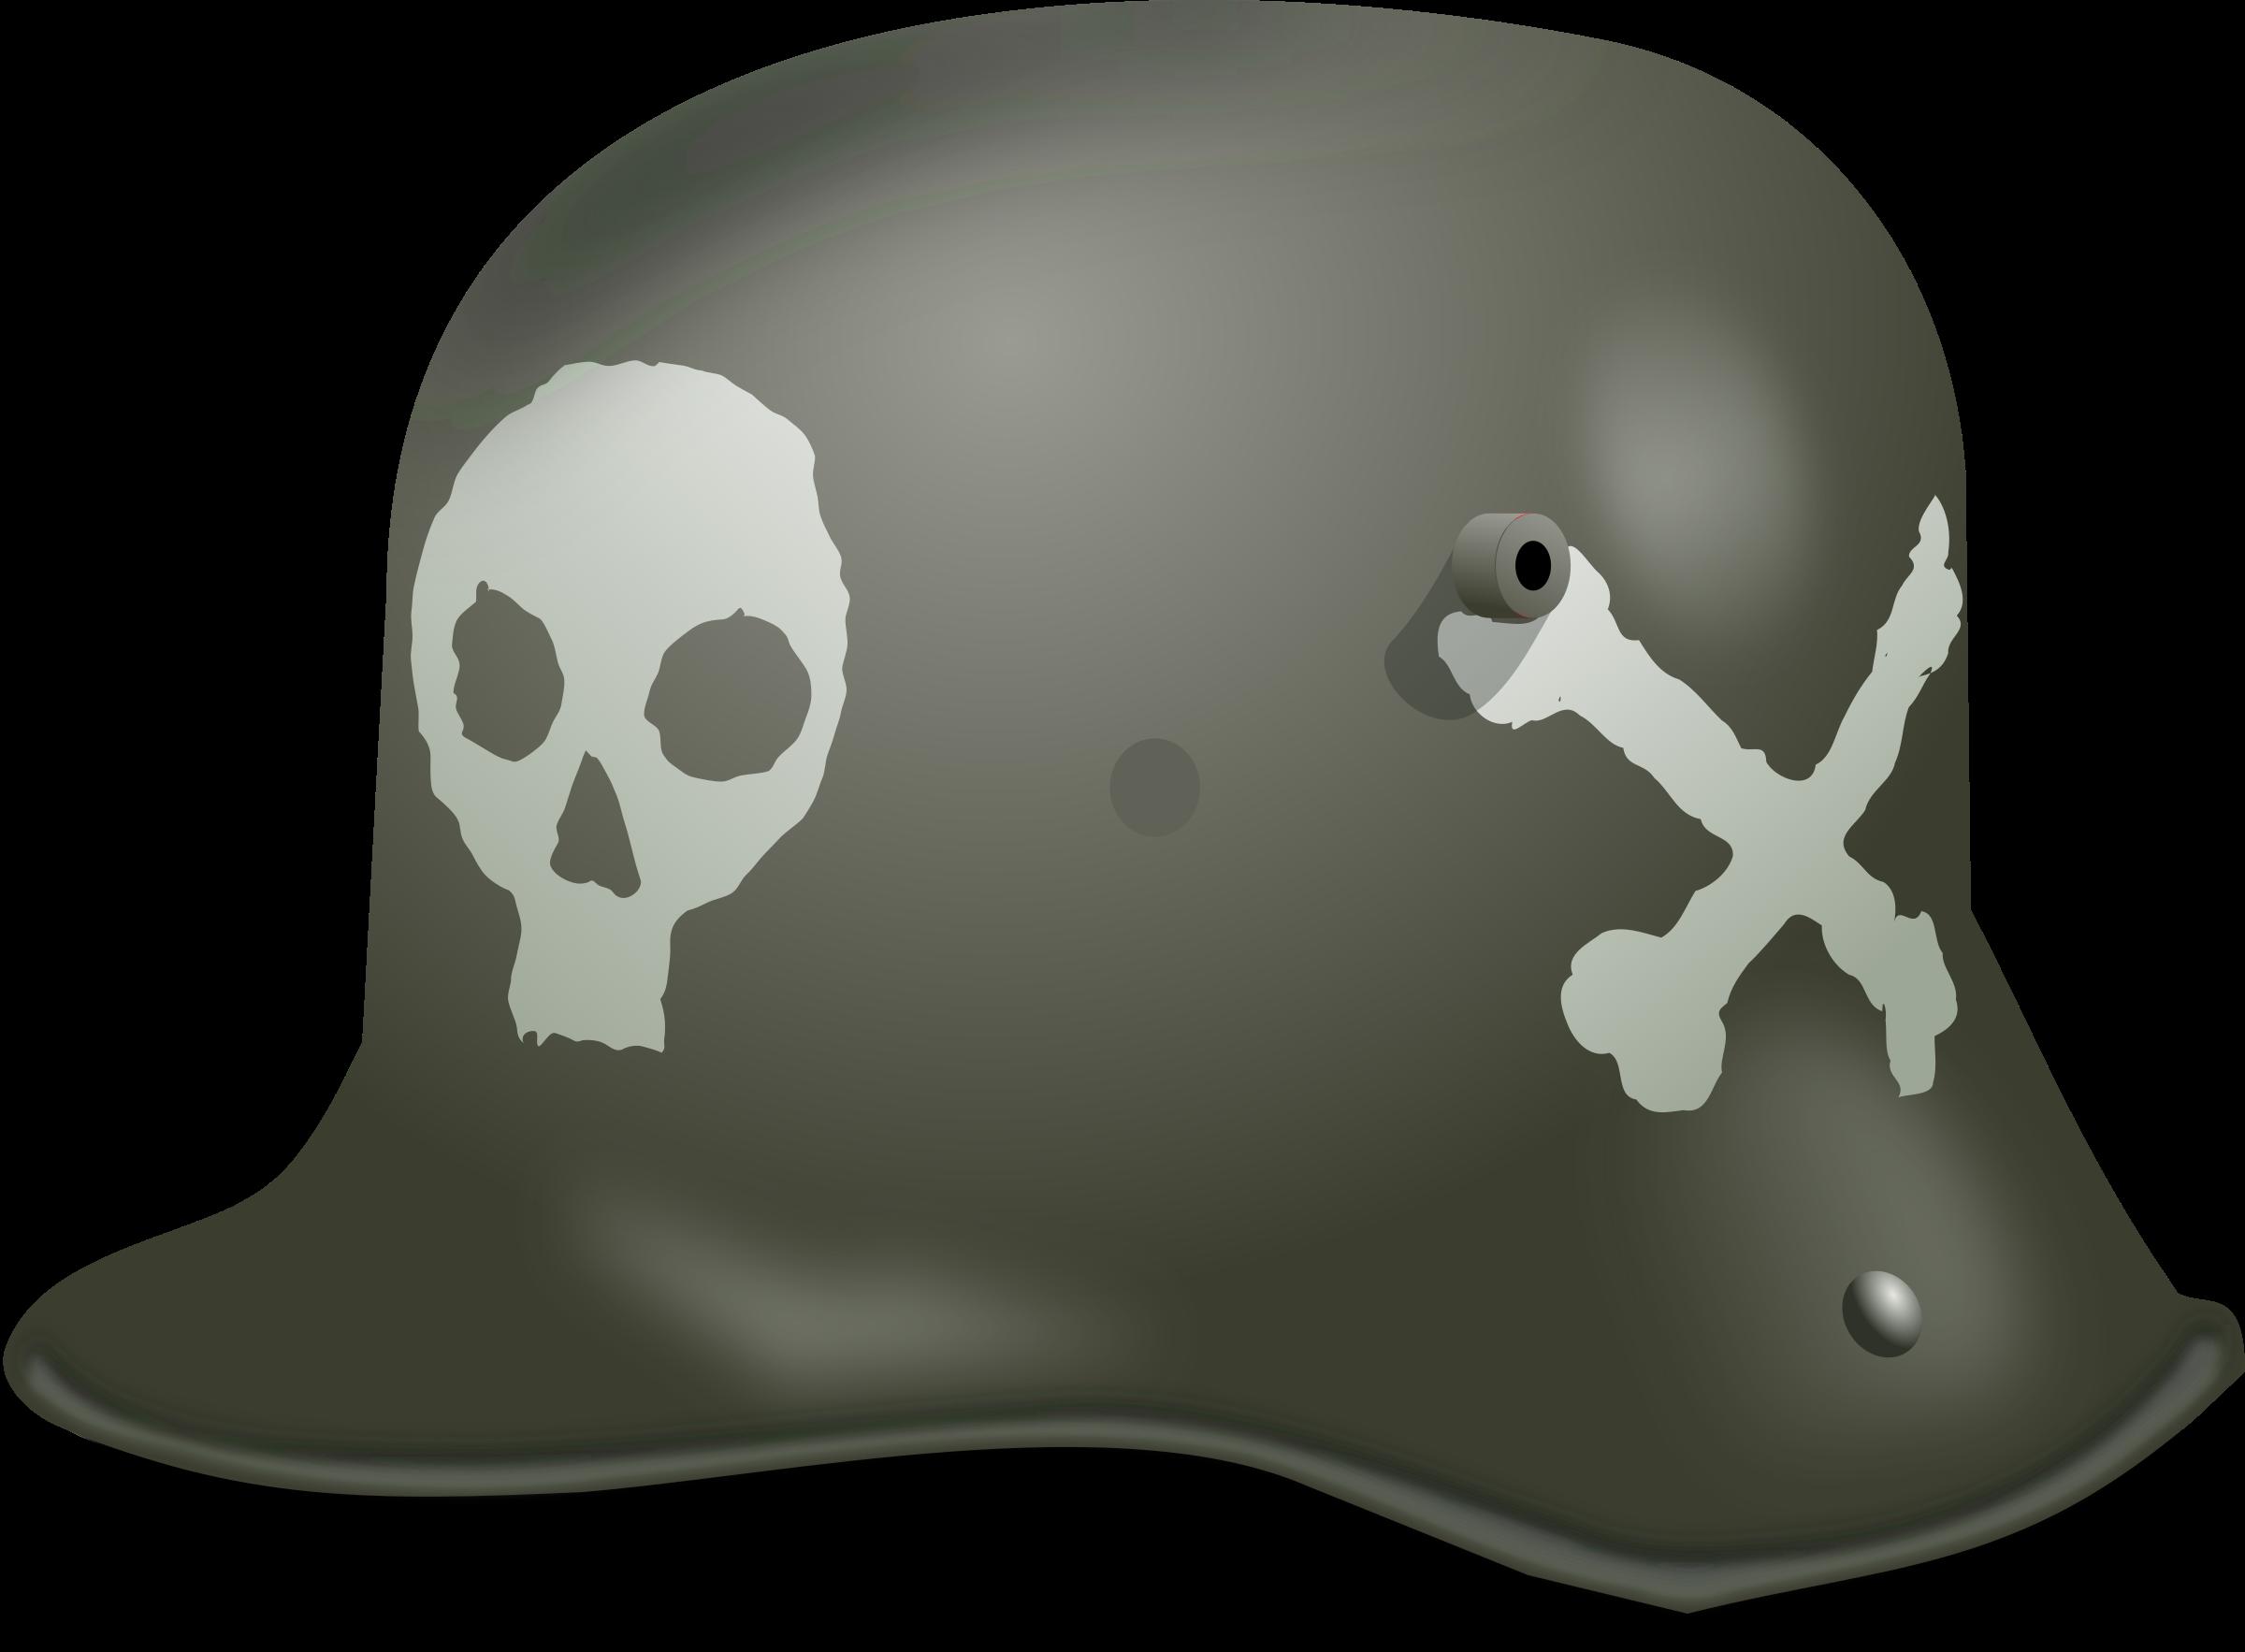 German clipart small. Stormtrooper helmet ww big